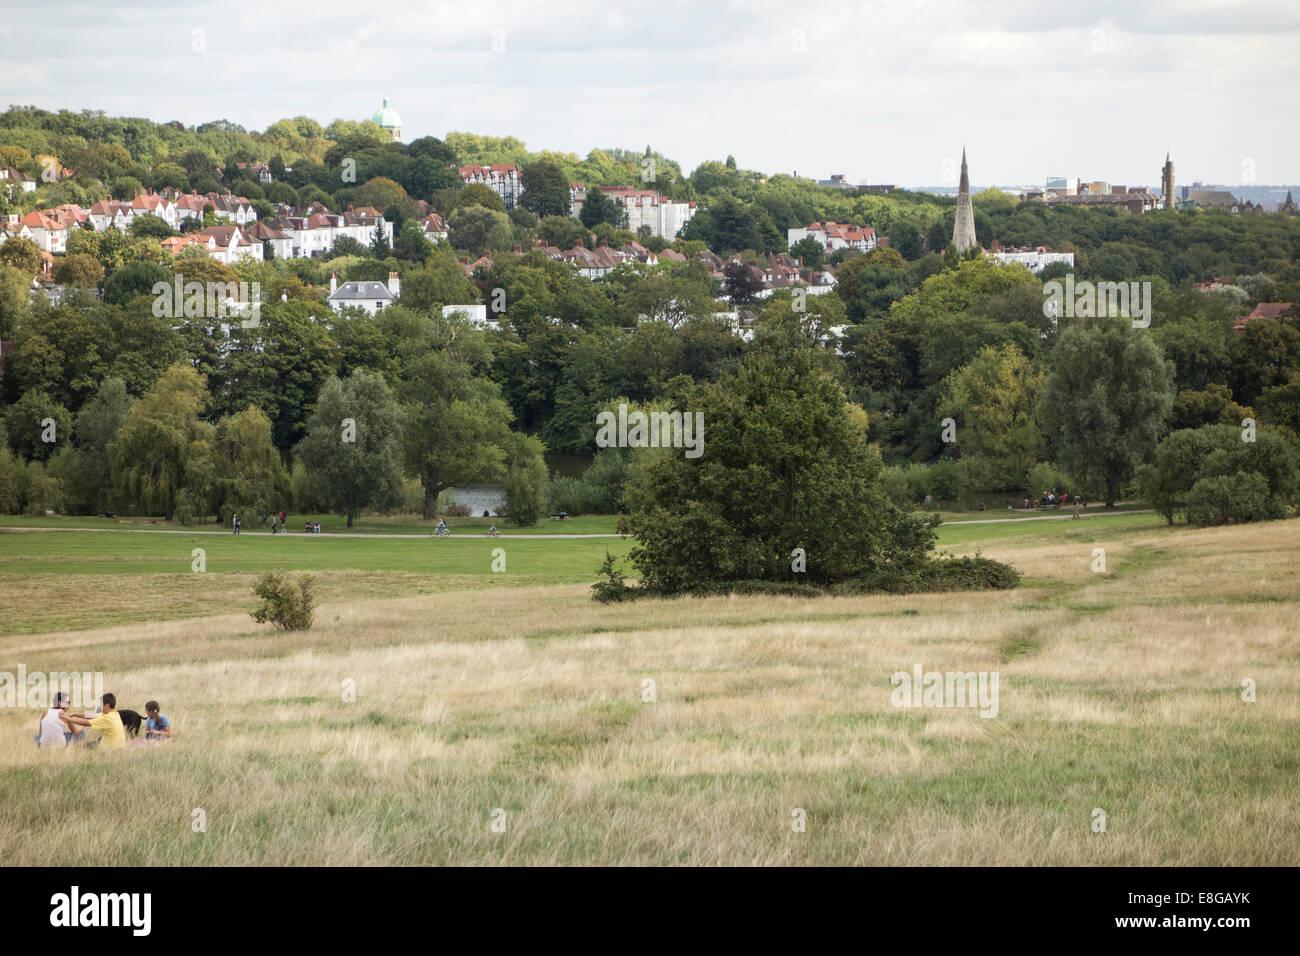 Hampstead Heath common park in North London near Highgate London England United Kingdom - Stock Image